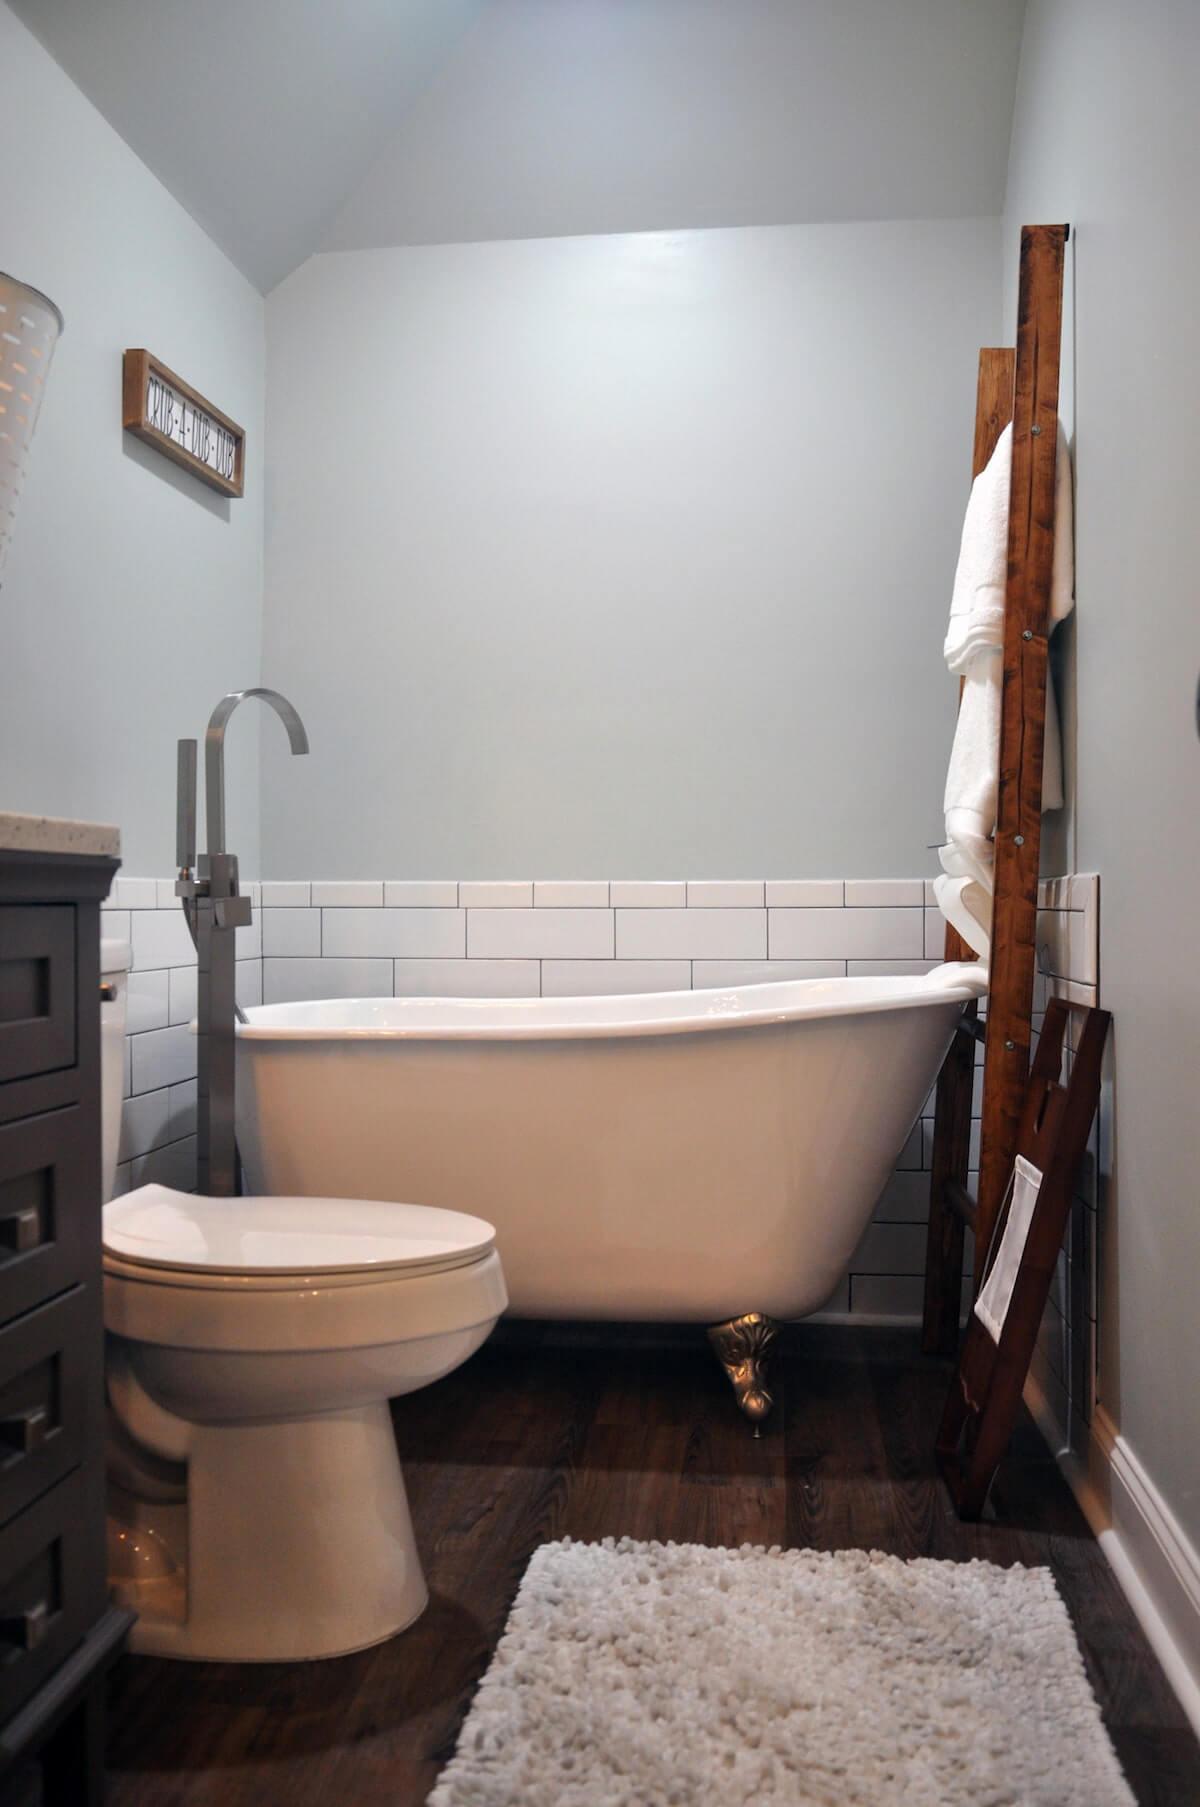 Freestanding tub bathroom remodel